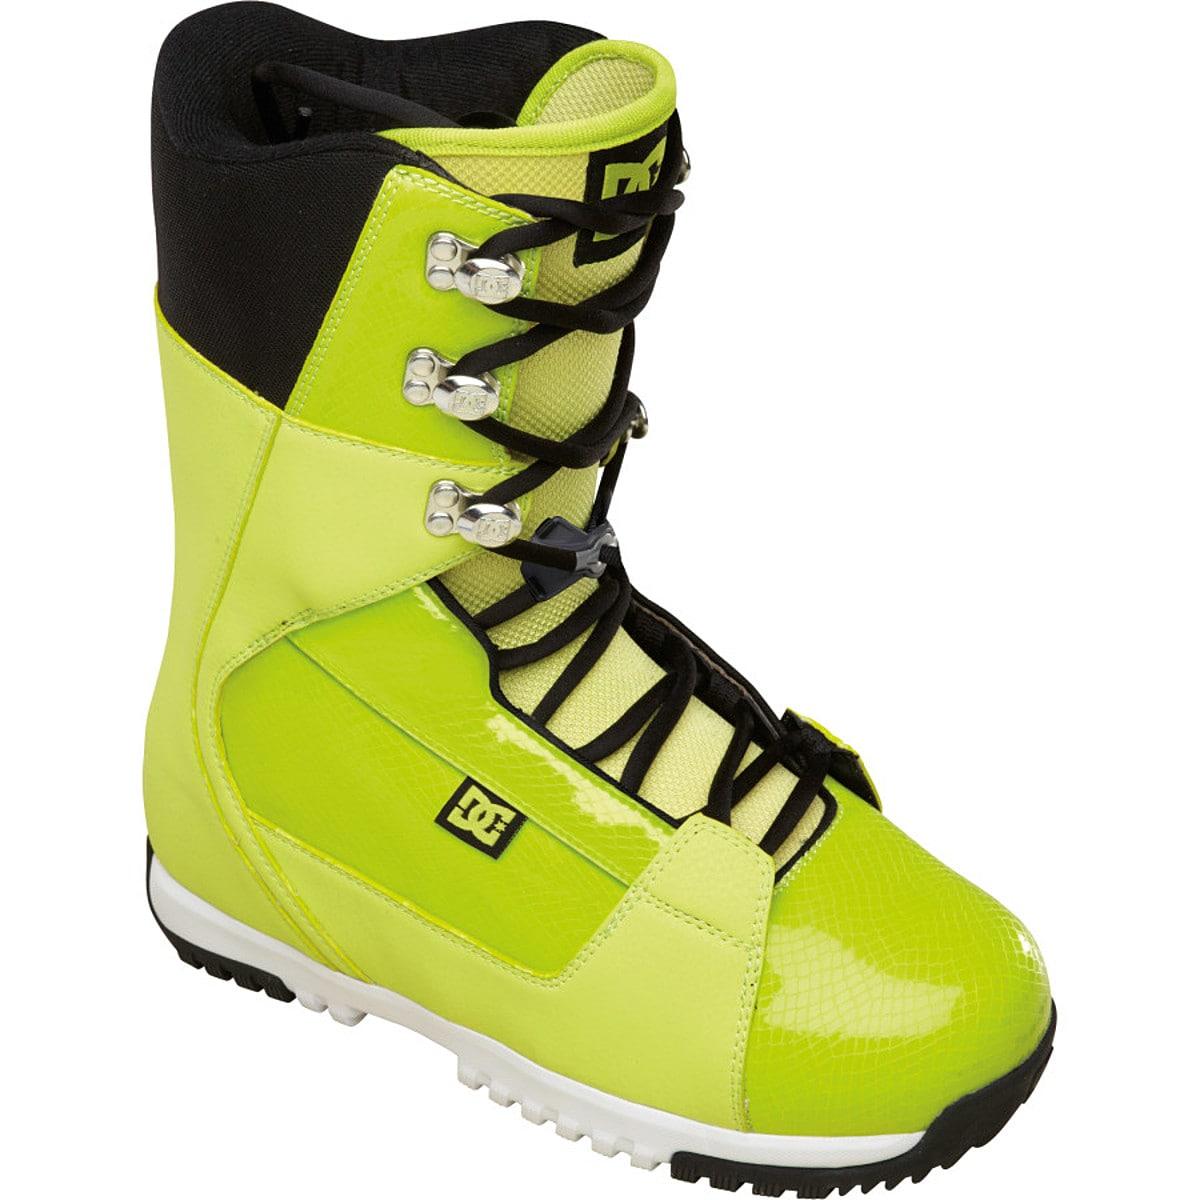 DC Park Snowboard Boot - Men's